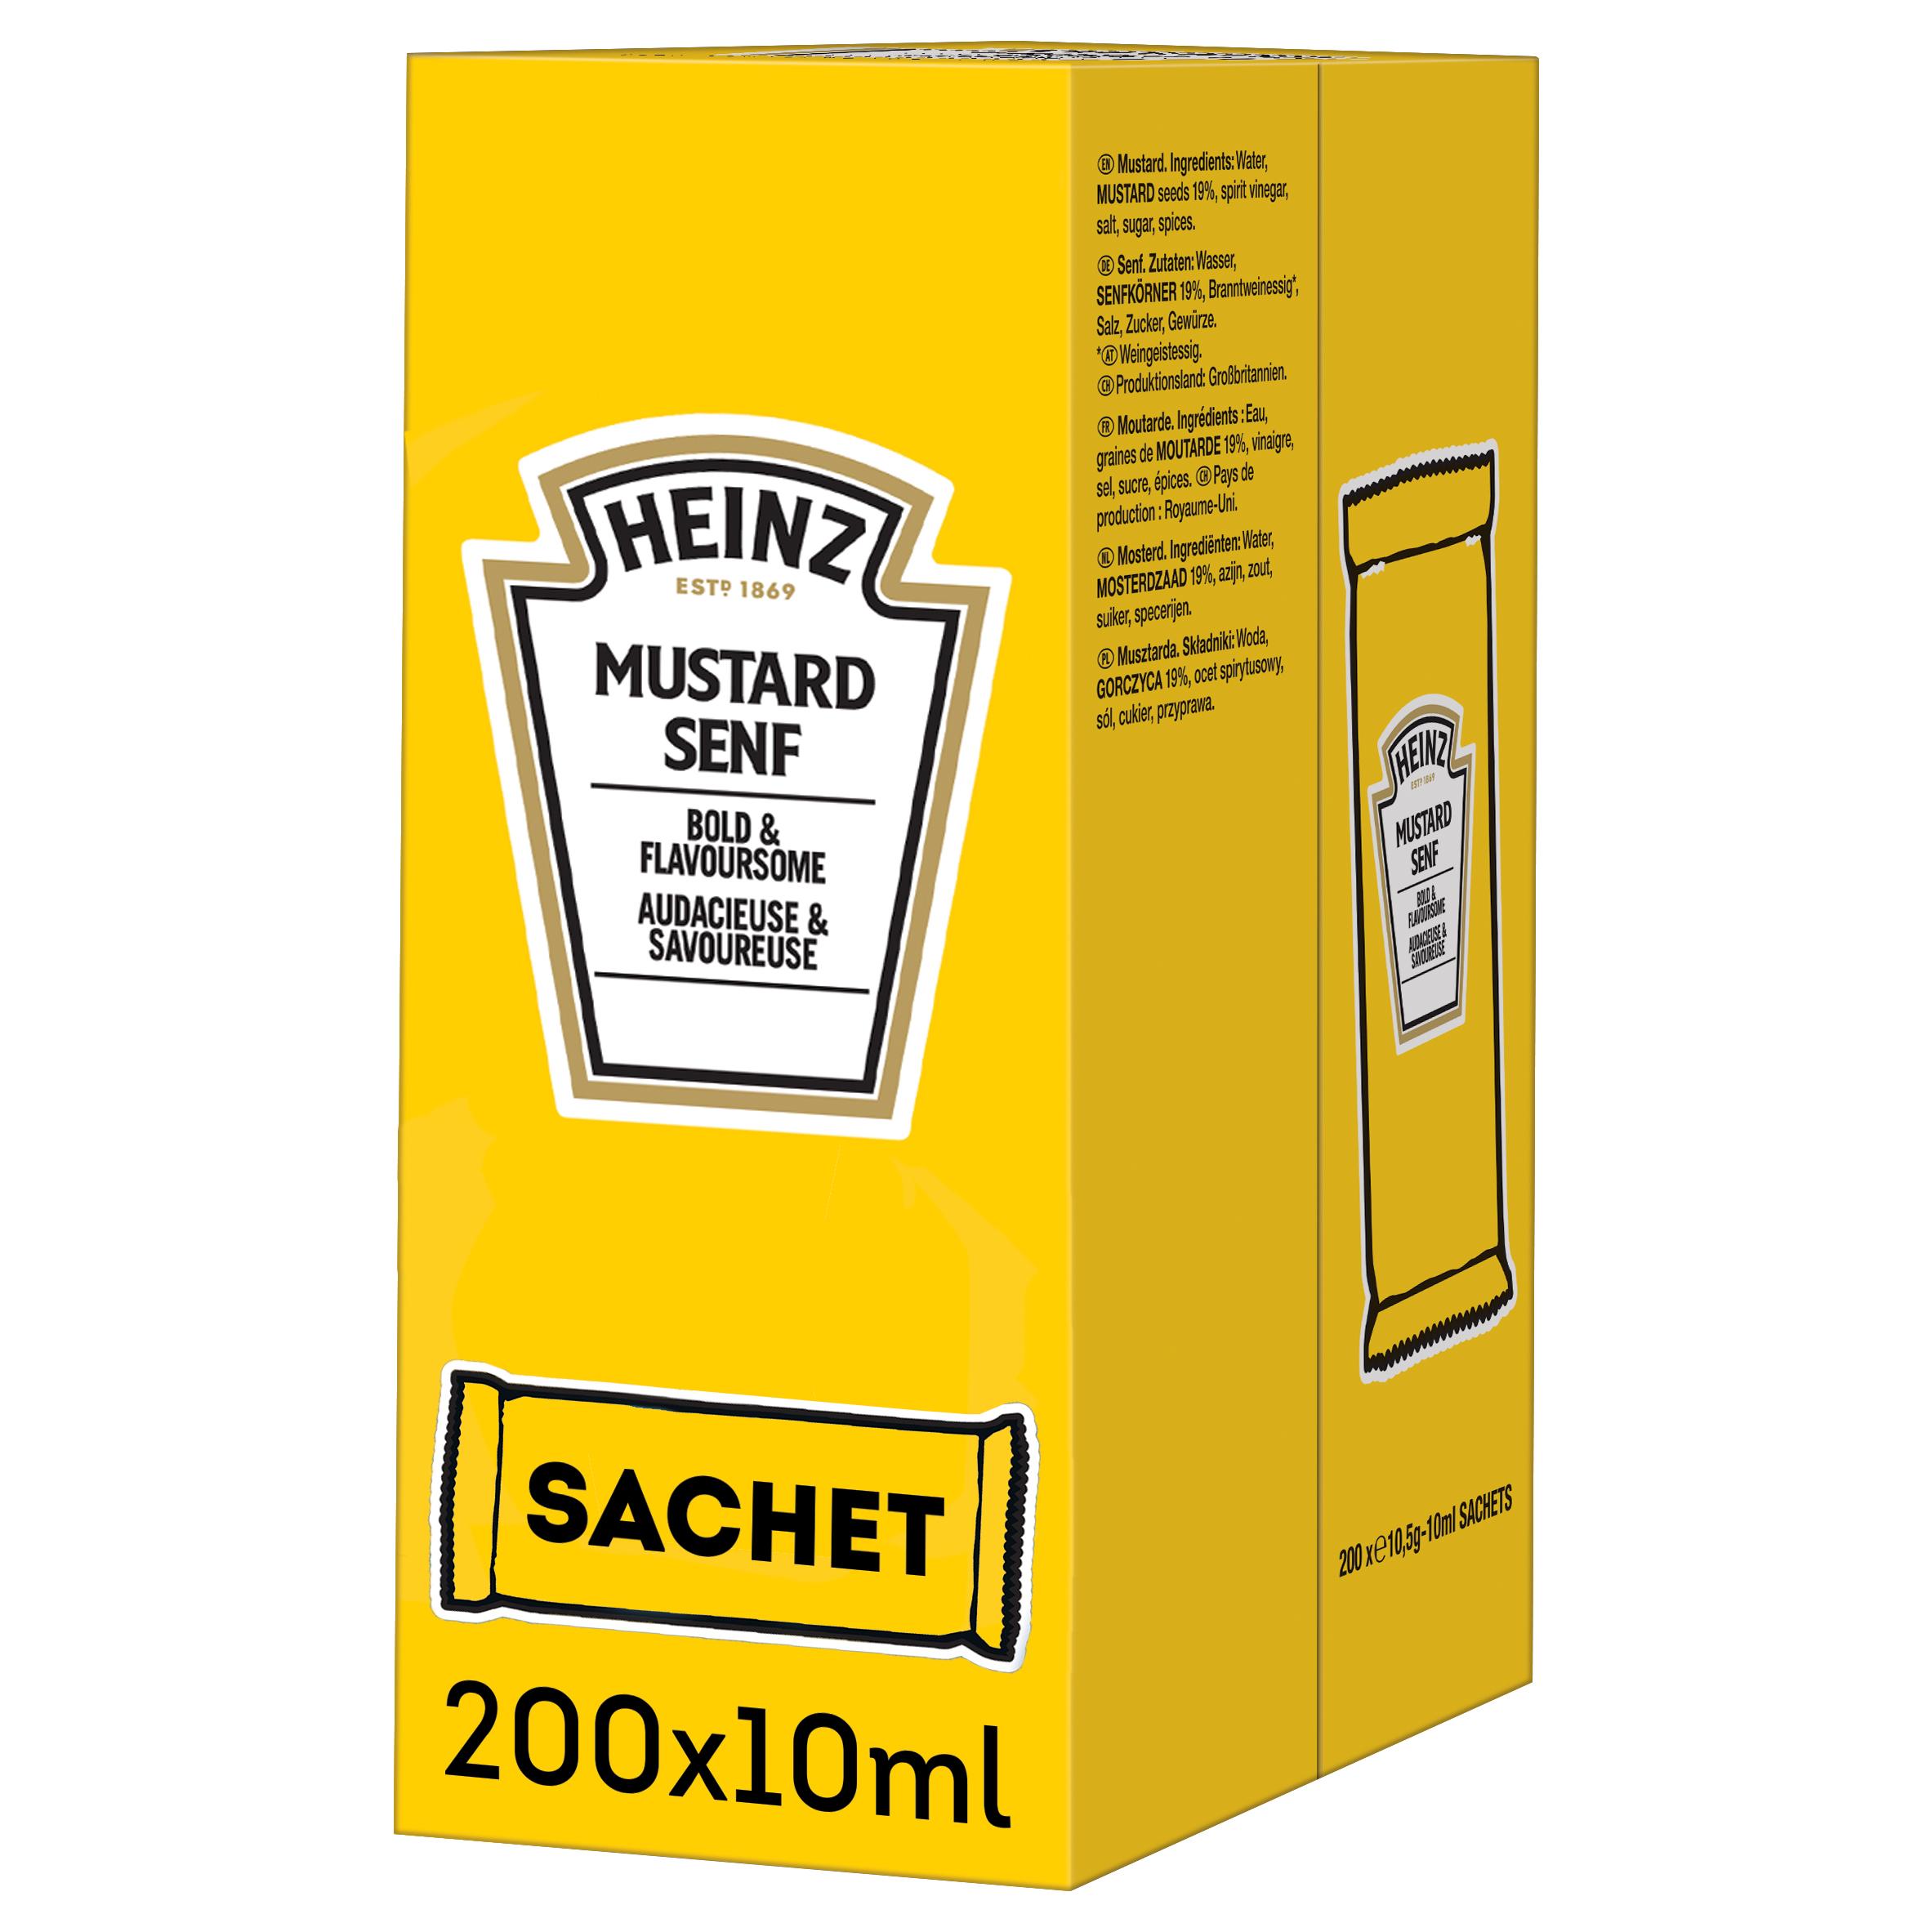 Heinz Mustard 10ml Sachet